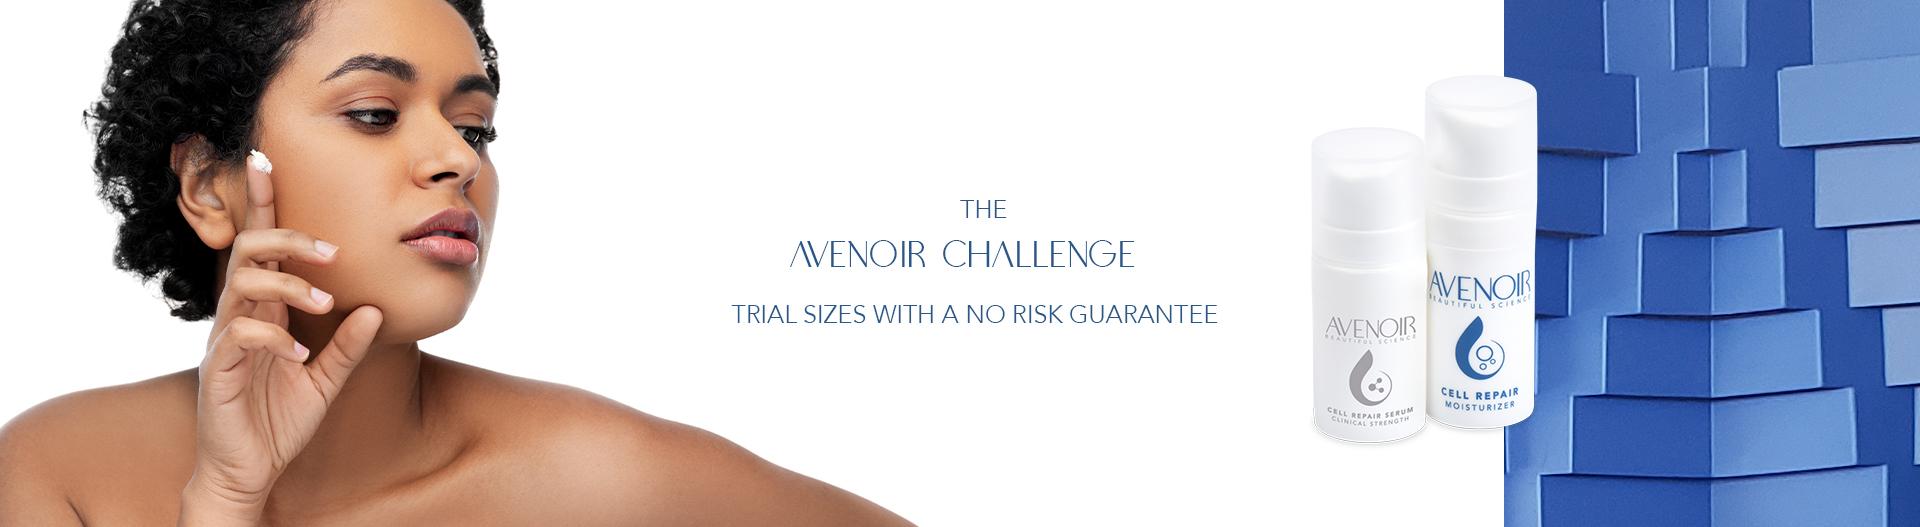 Avenoir Cosmetics Cell Repair Toner